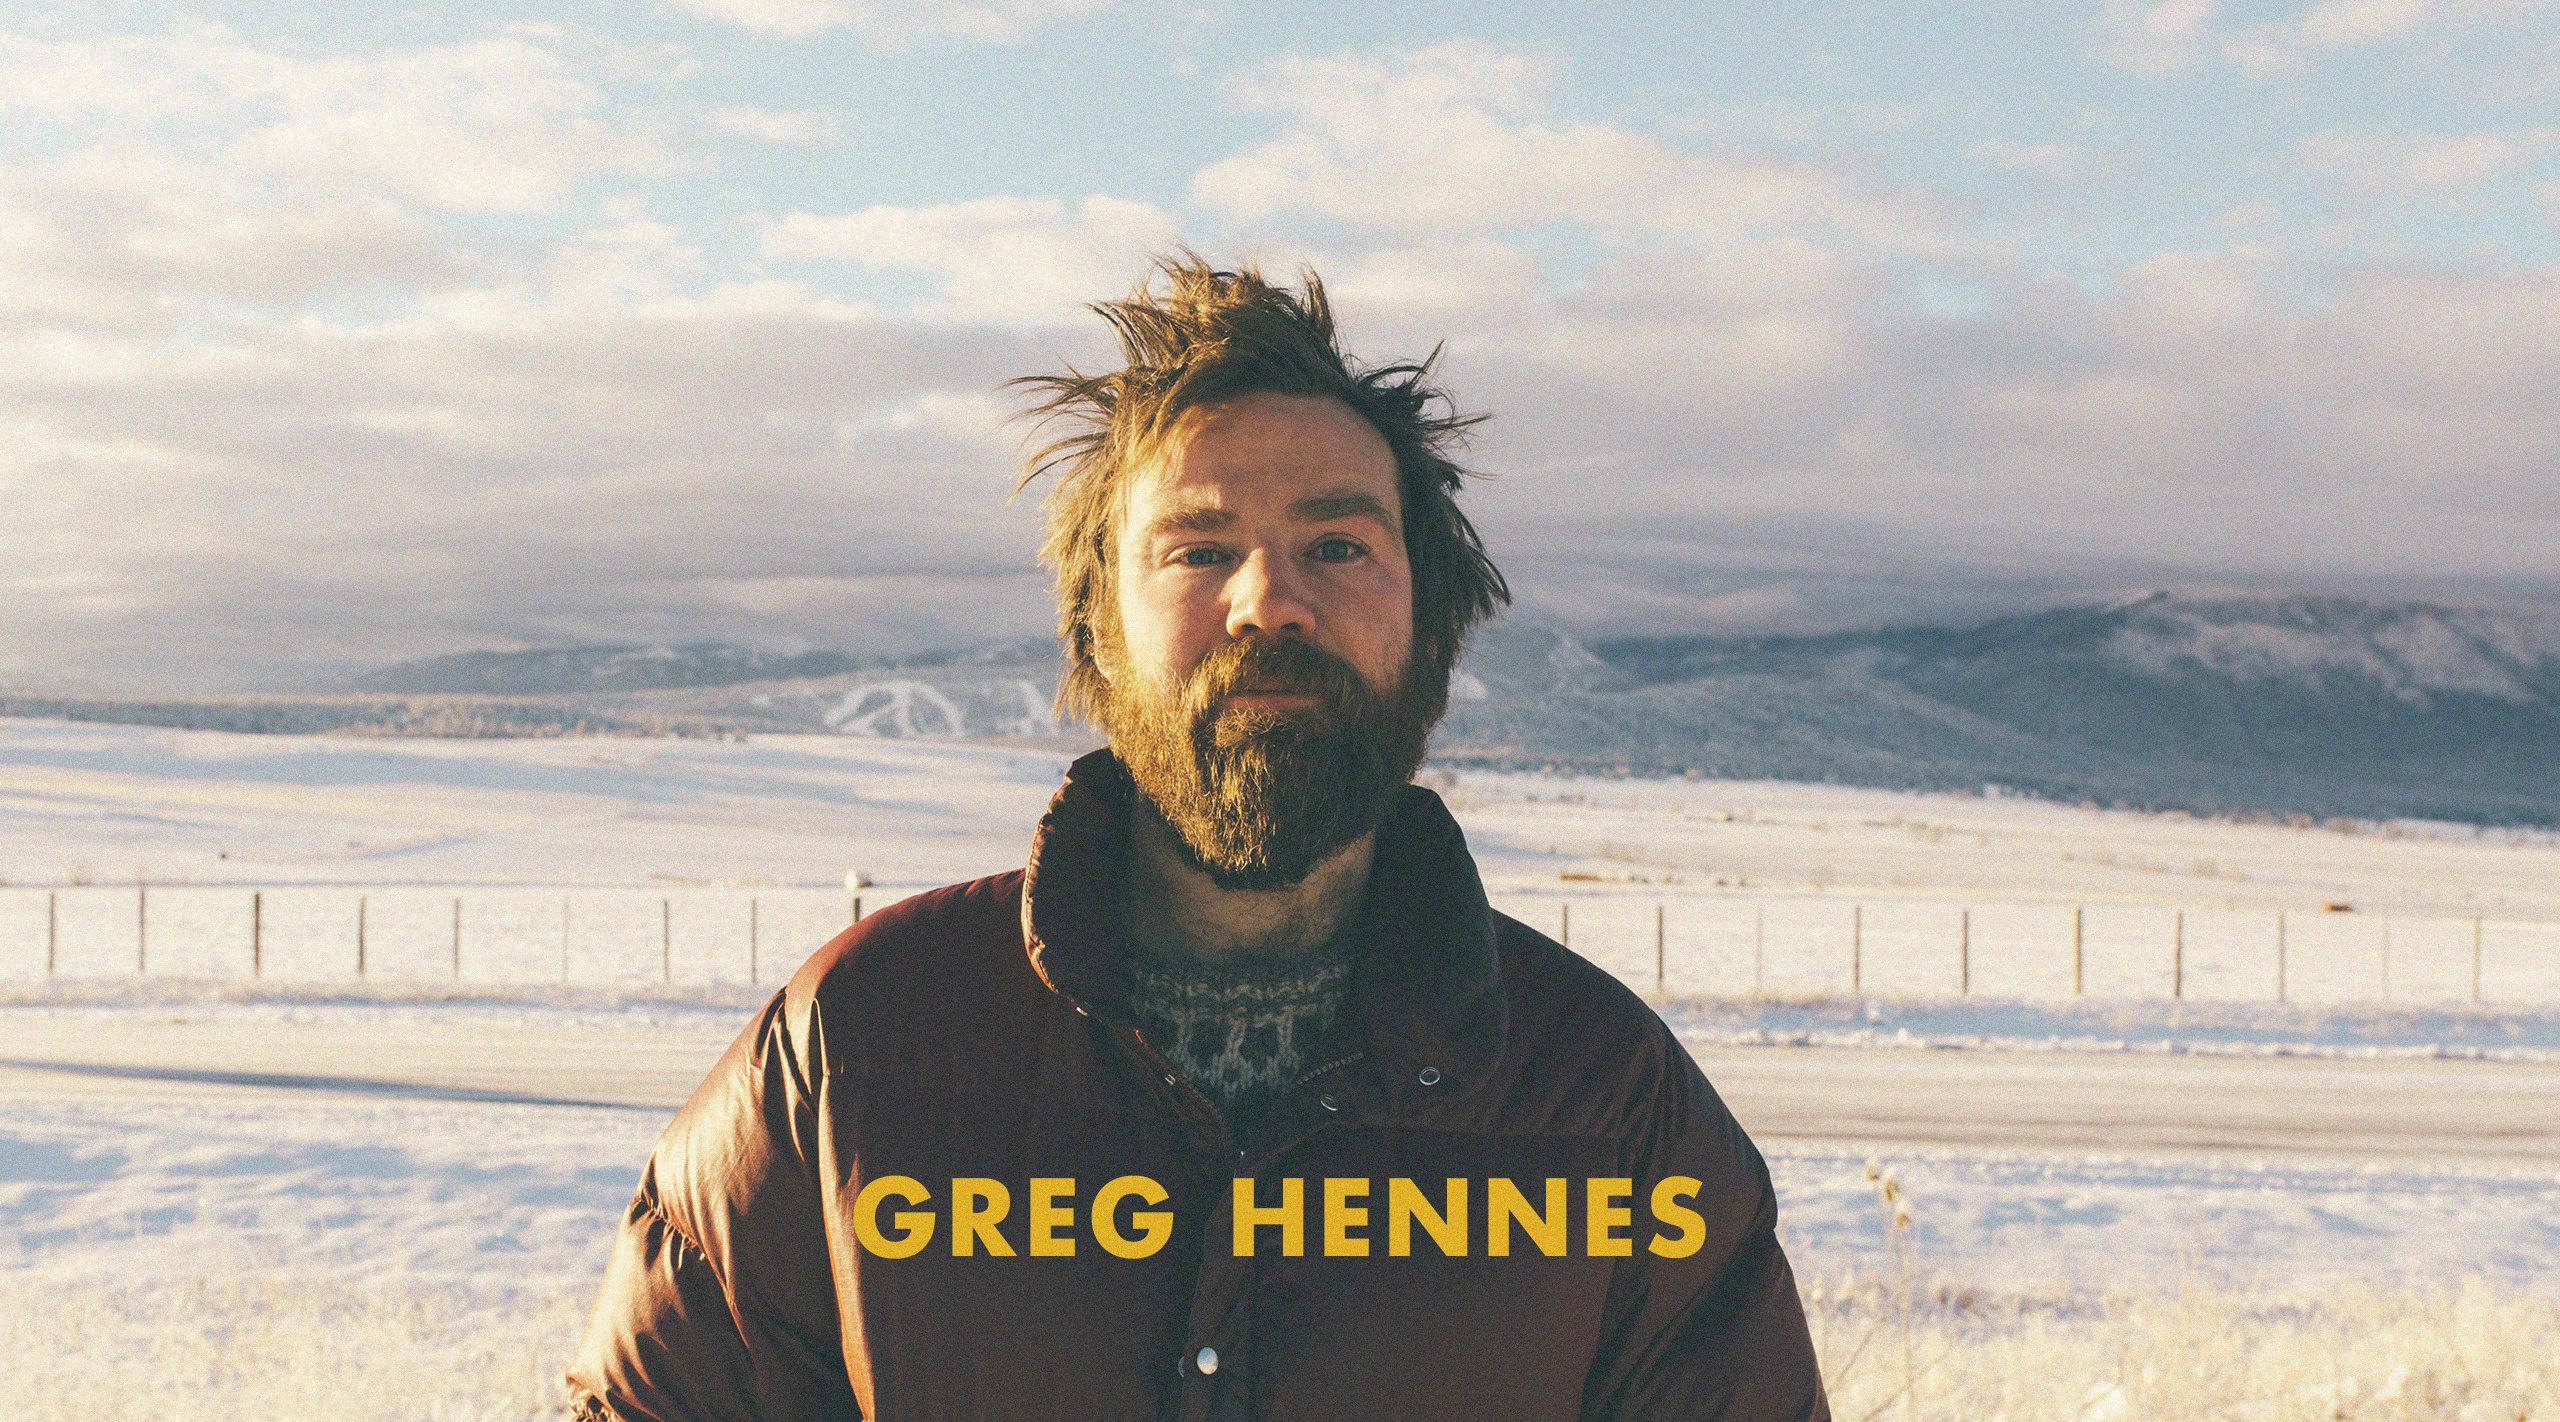 Greg-Hennes-4